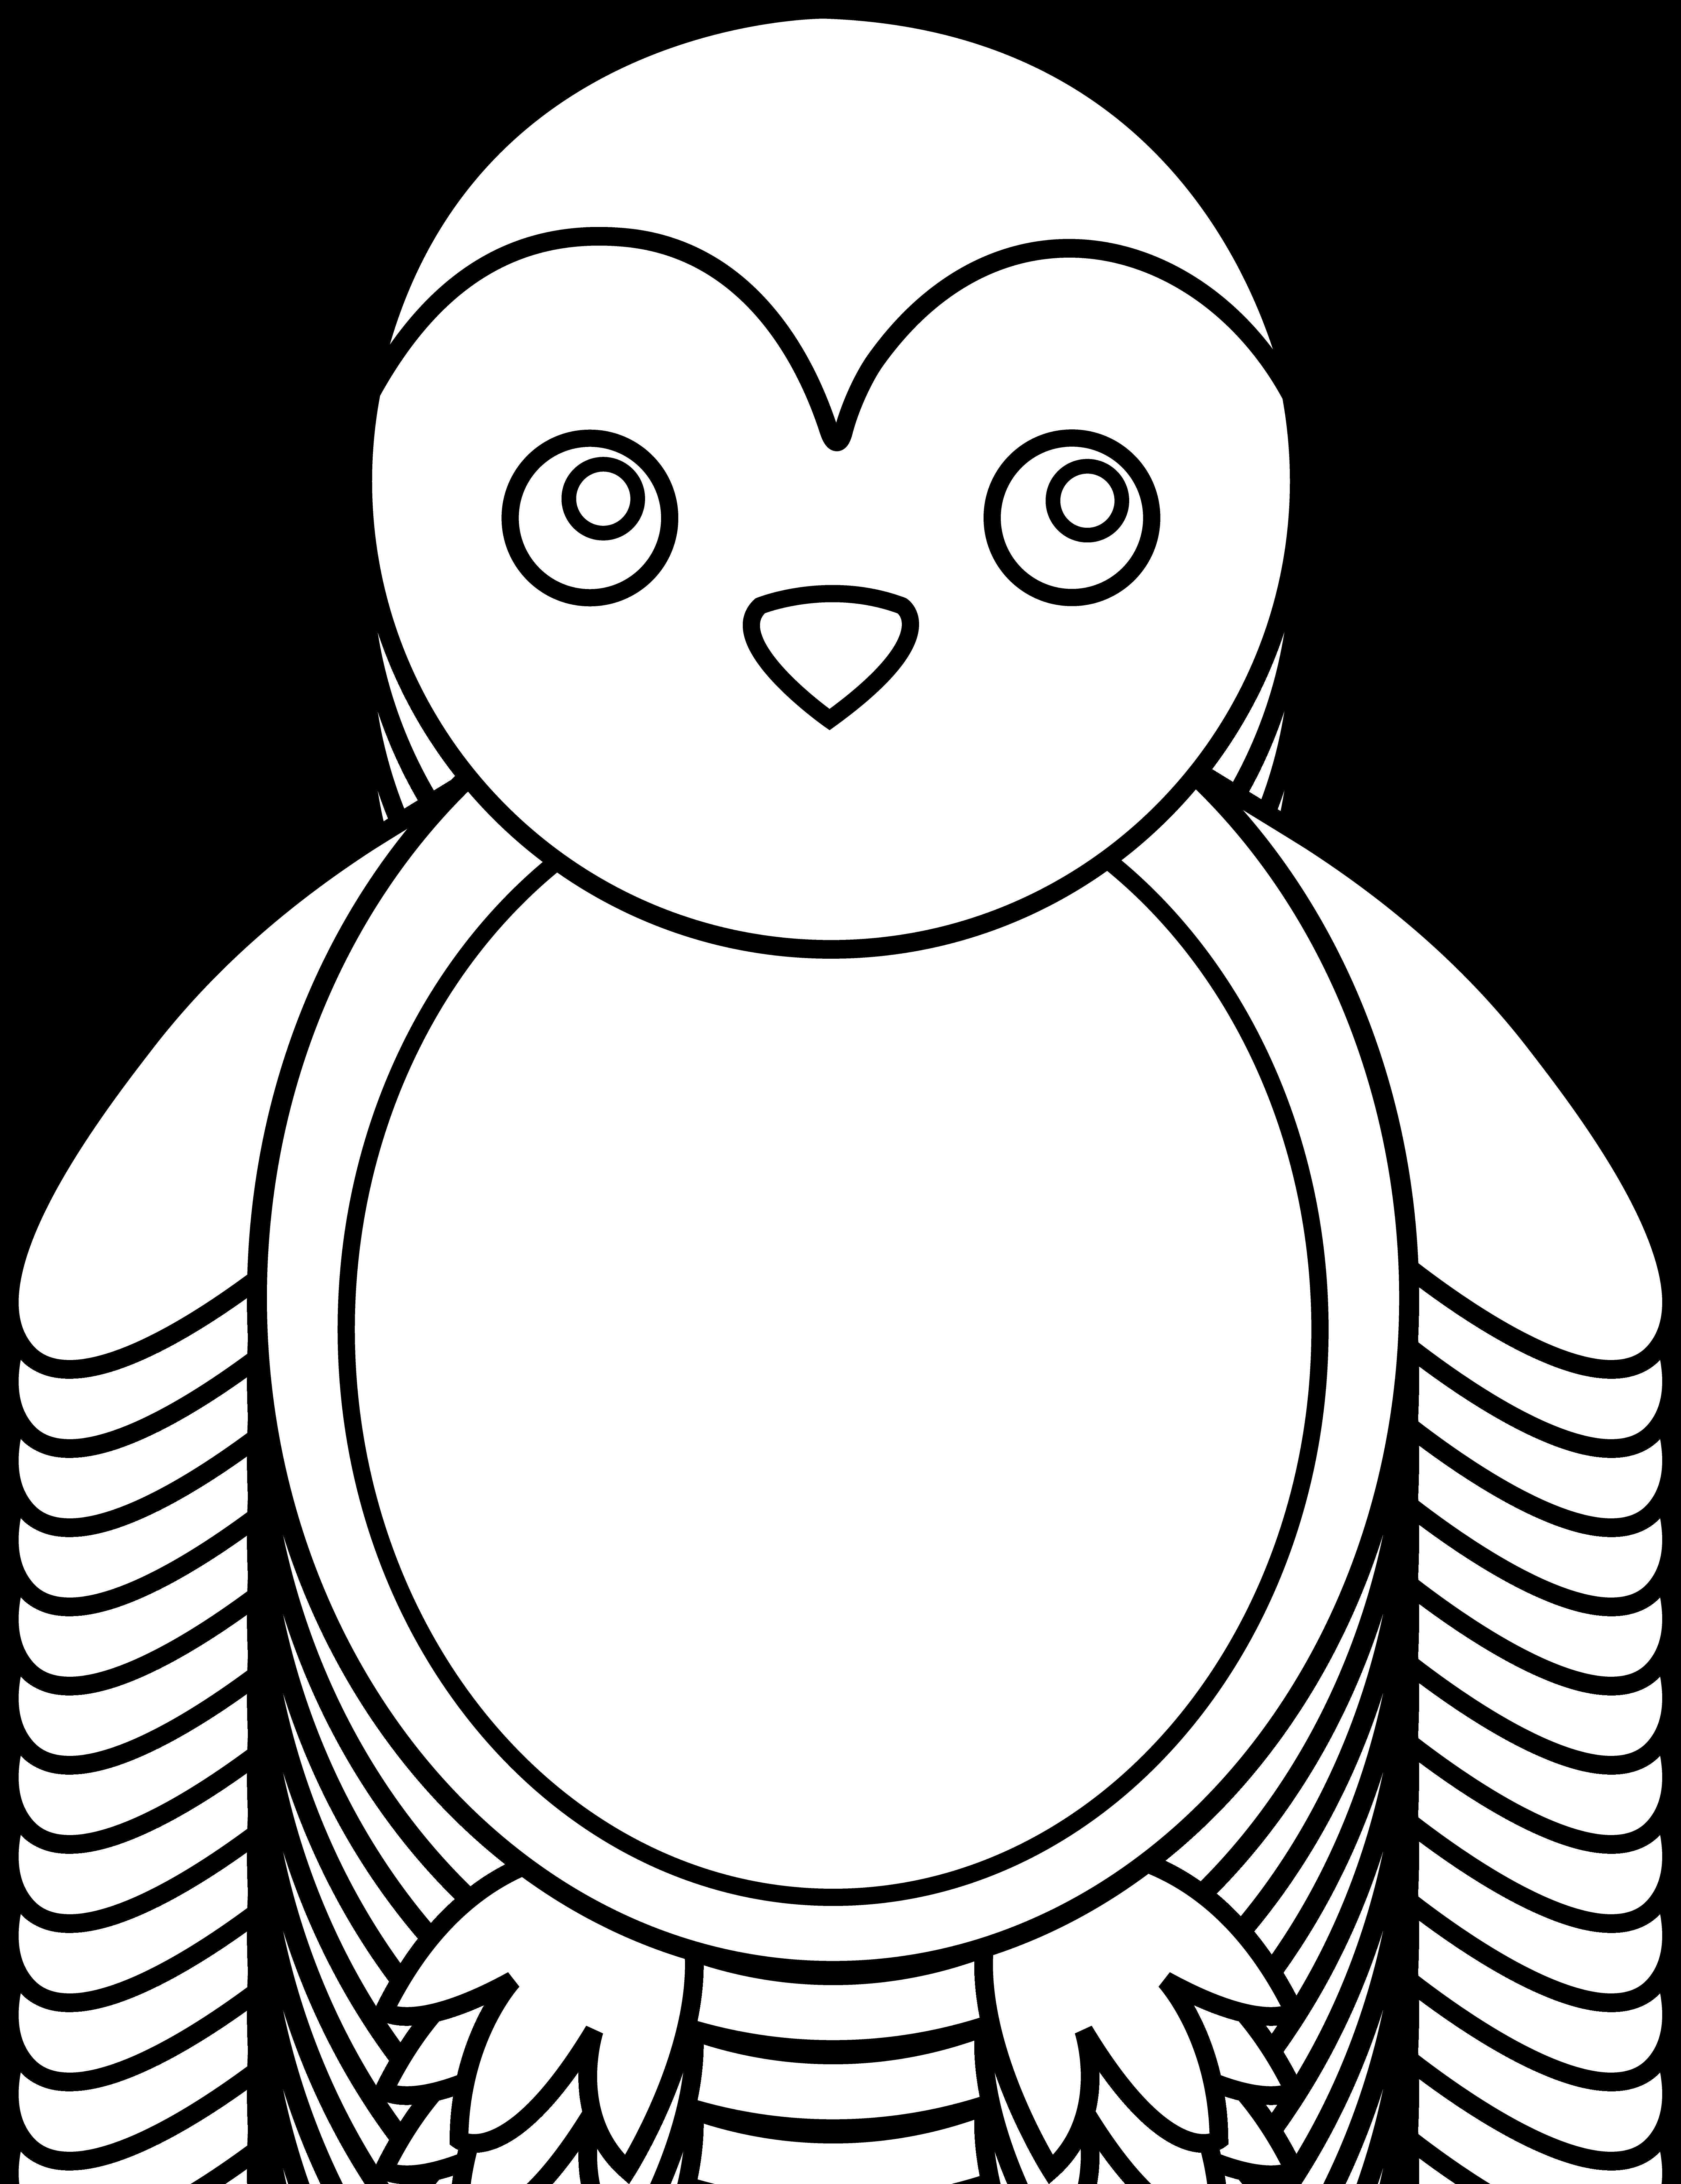 January clipart black and white nursery freeuse Penguin Clipart Black And White Free | Free download best Penguin ... freeuse